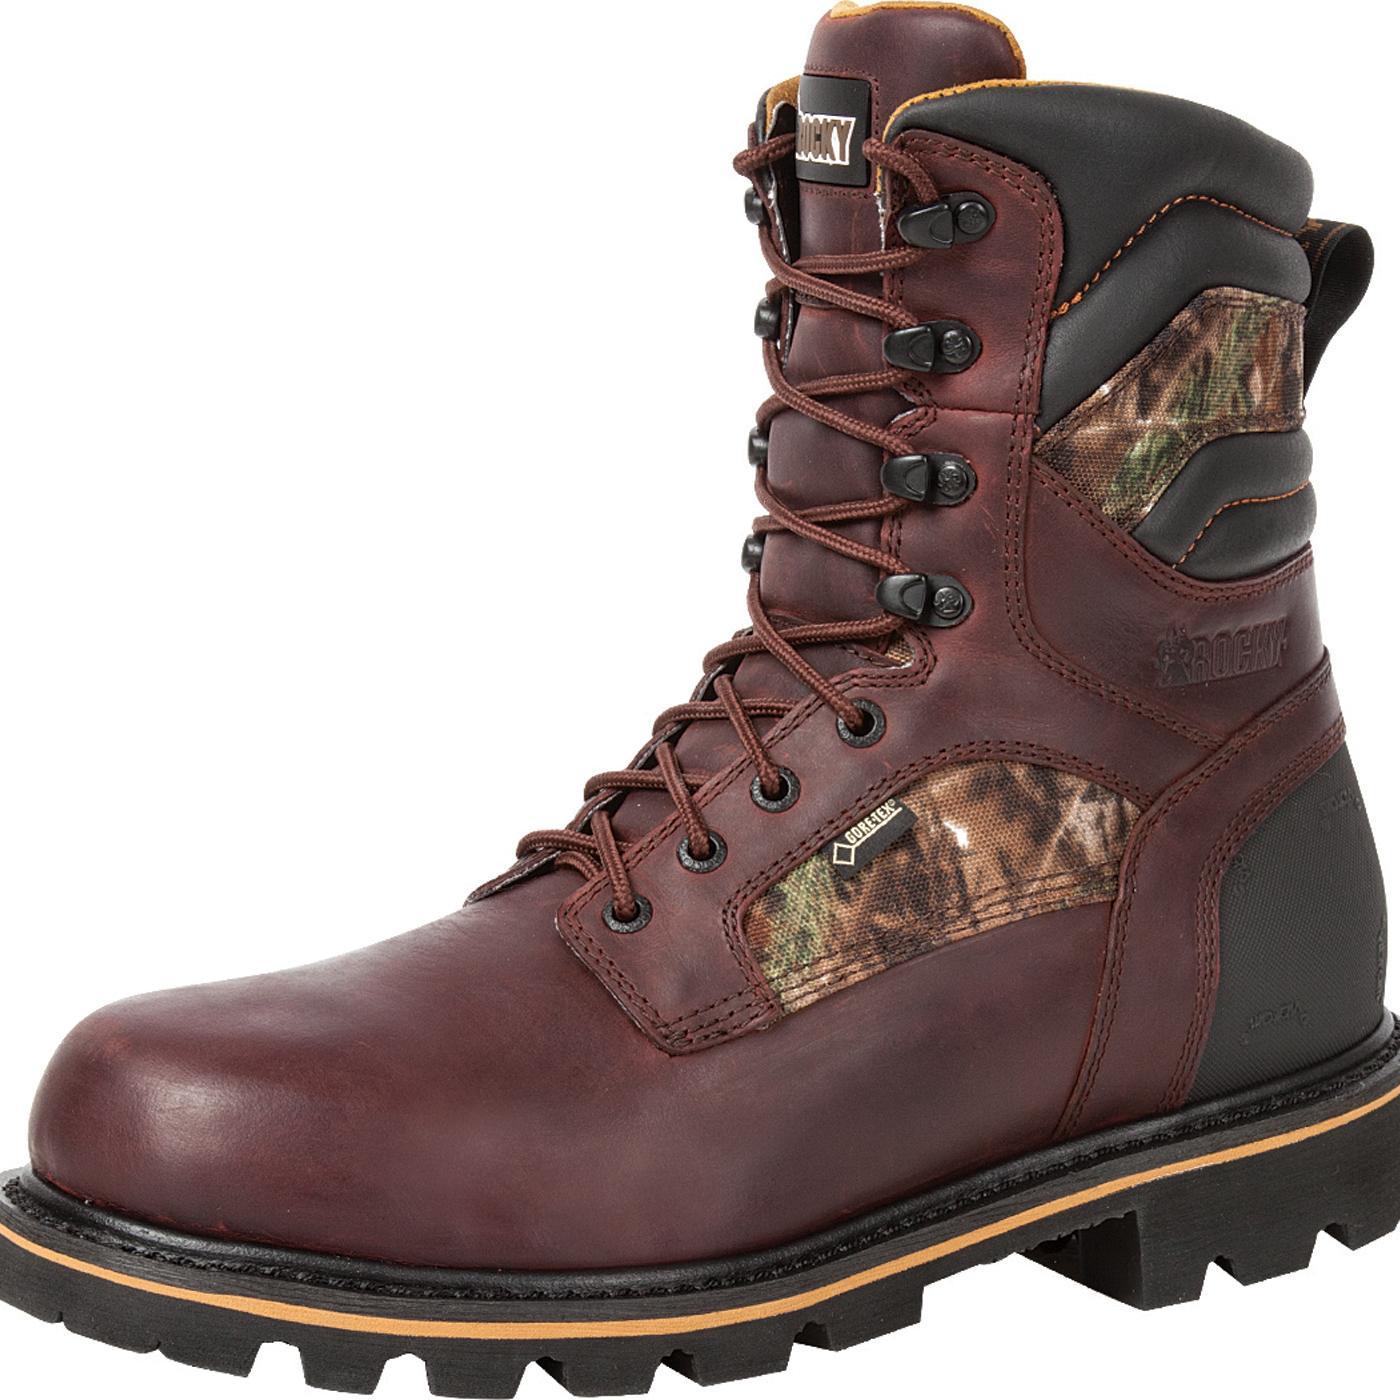 Rocky Governor GORE-TEX® Outdoor Boots, #RKYO001